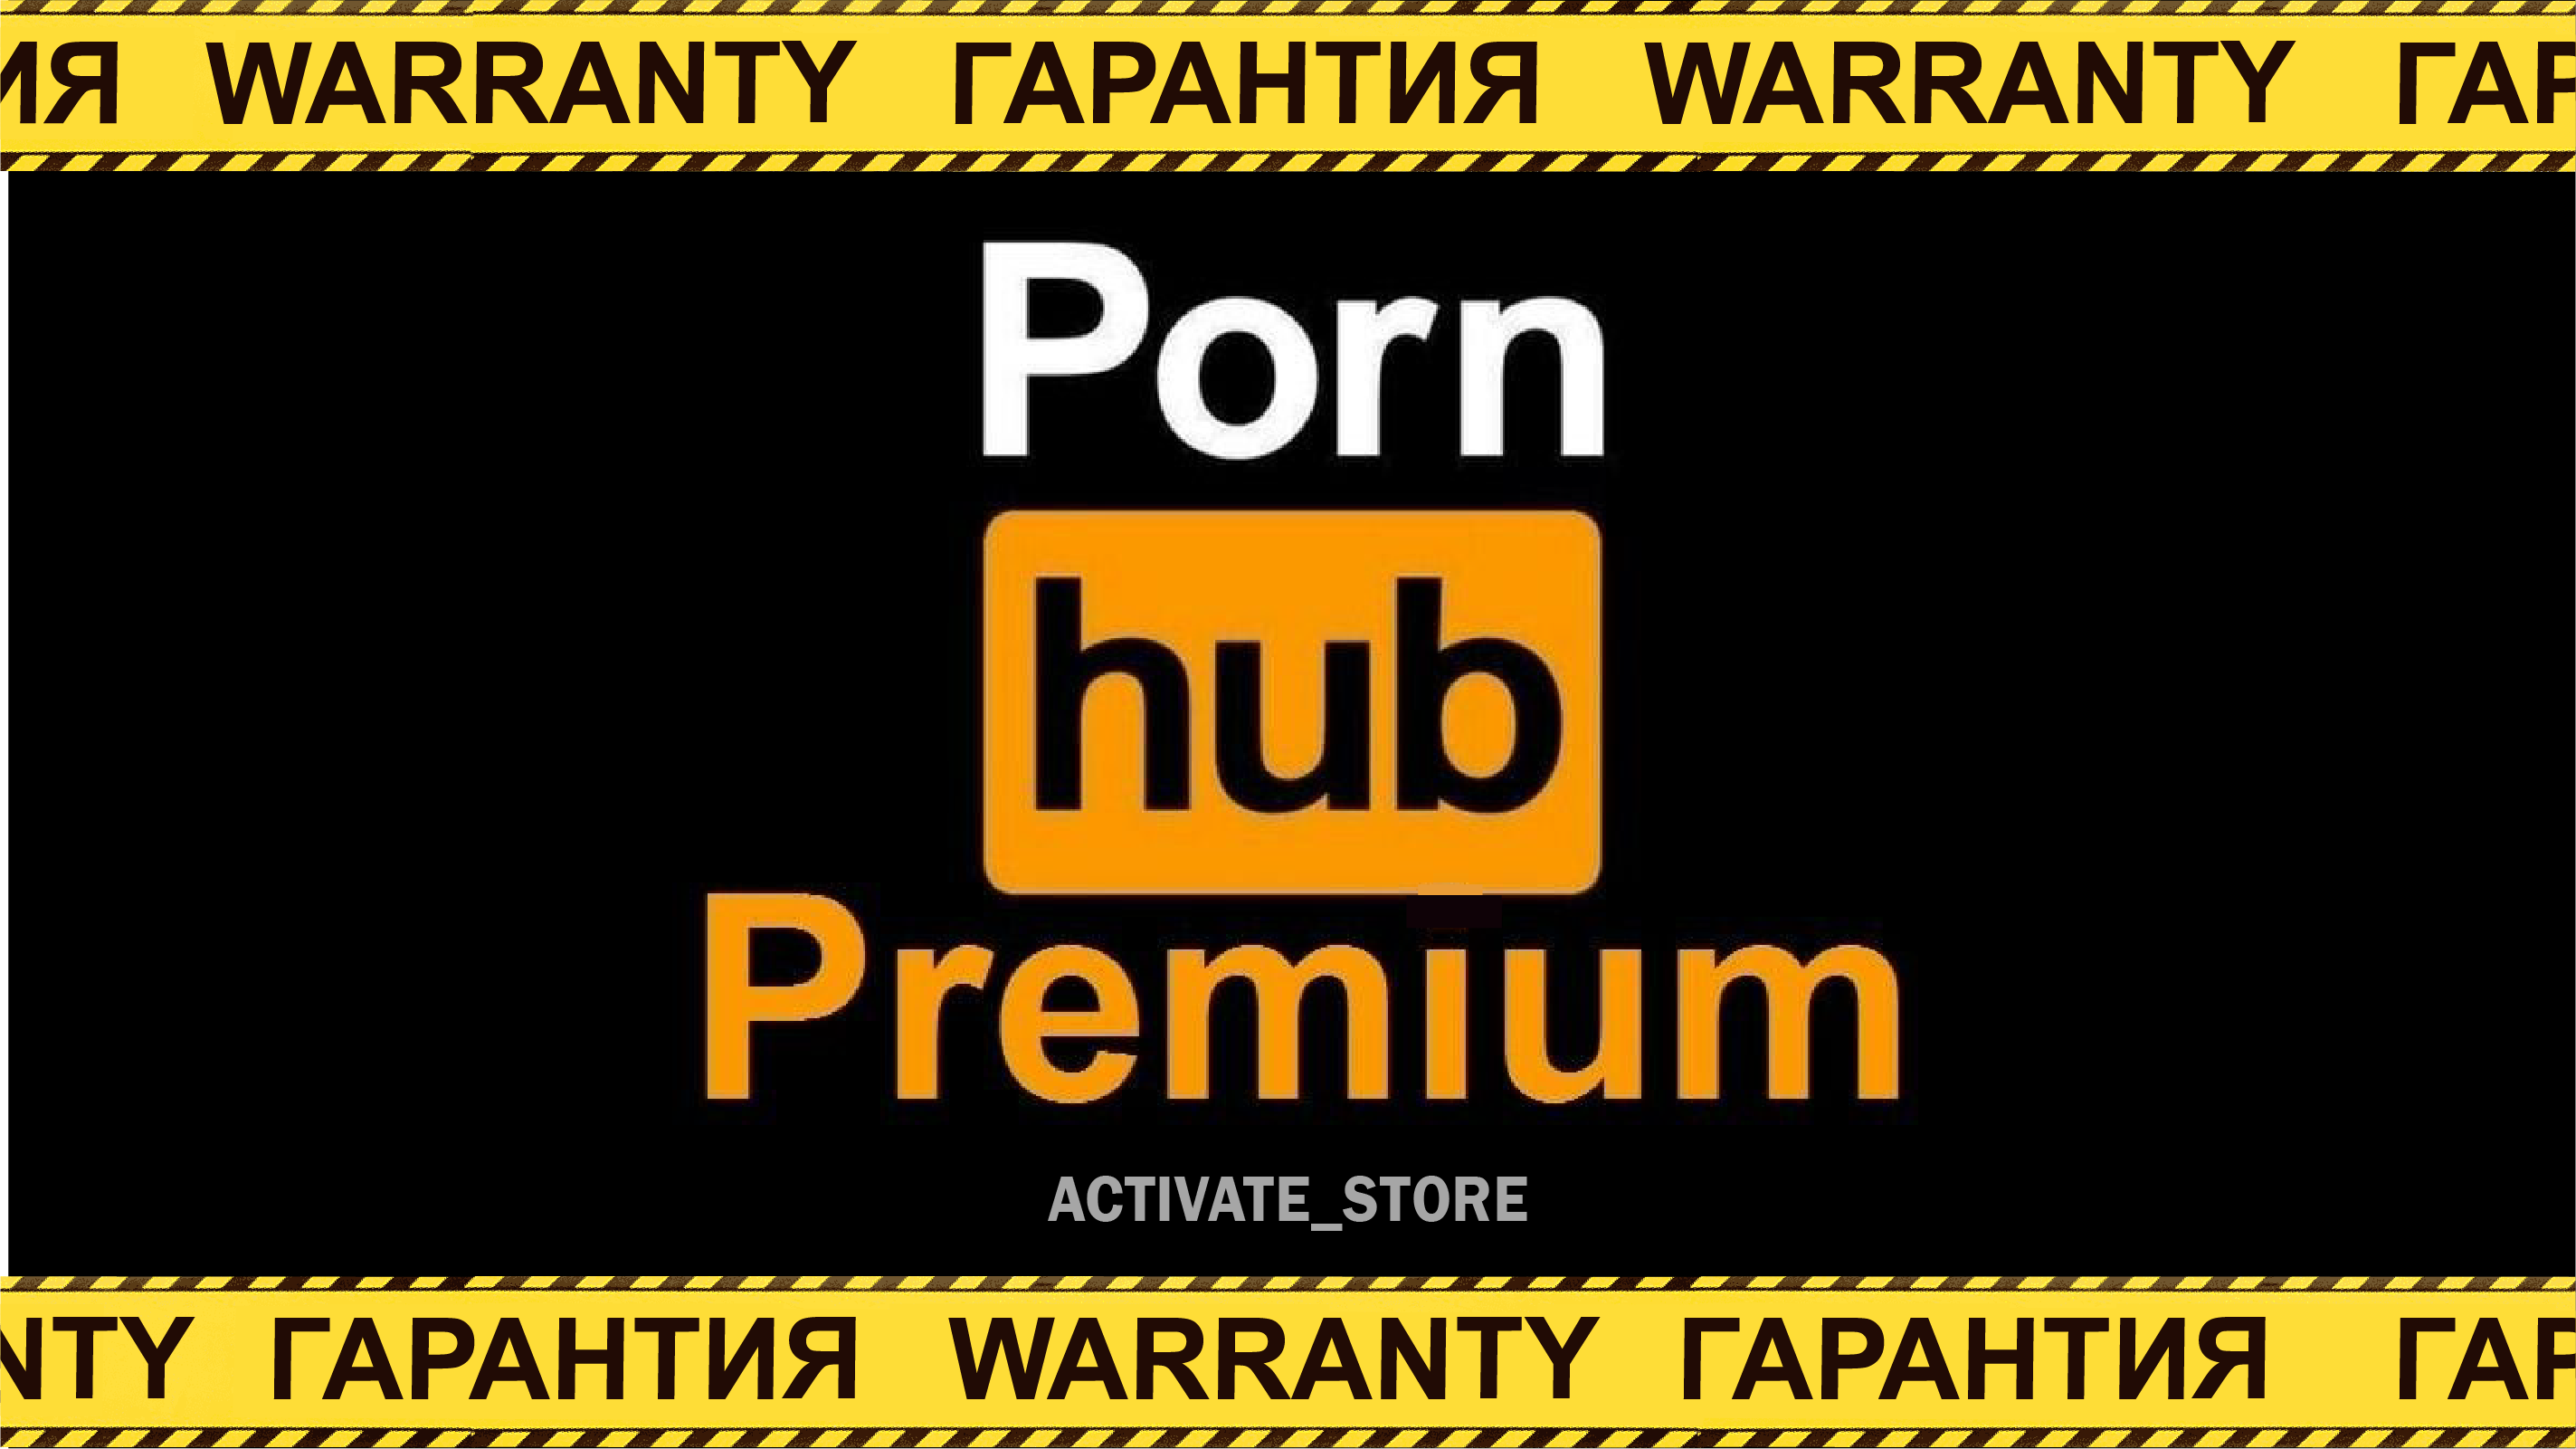 Фотография 🔥pornhub premium аккаунт 4k ultra hd гарантия🔥